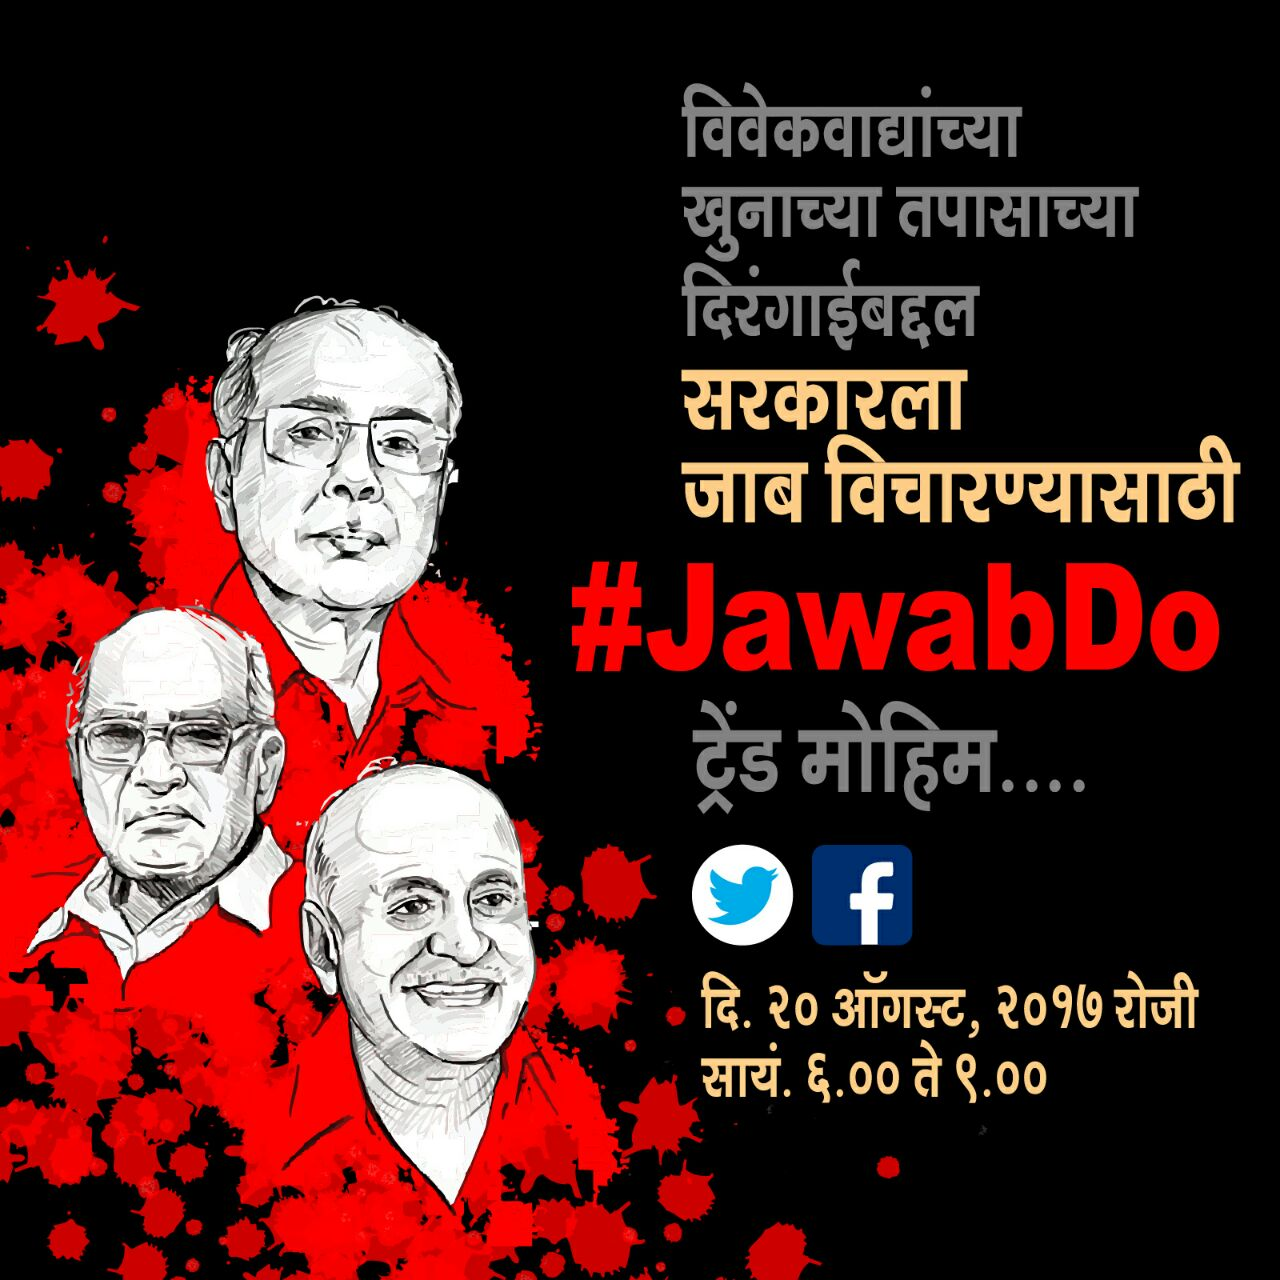 JawabDo - Social Media Campaign